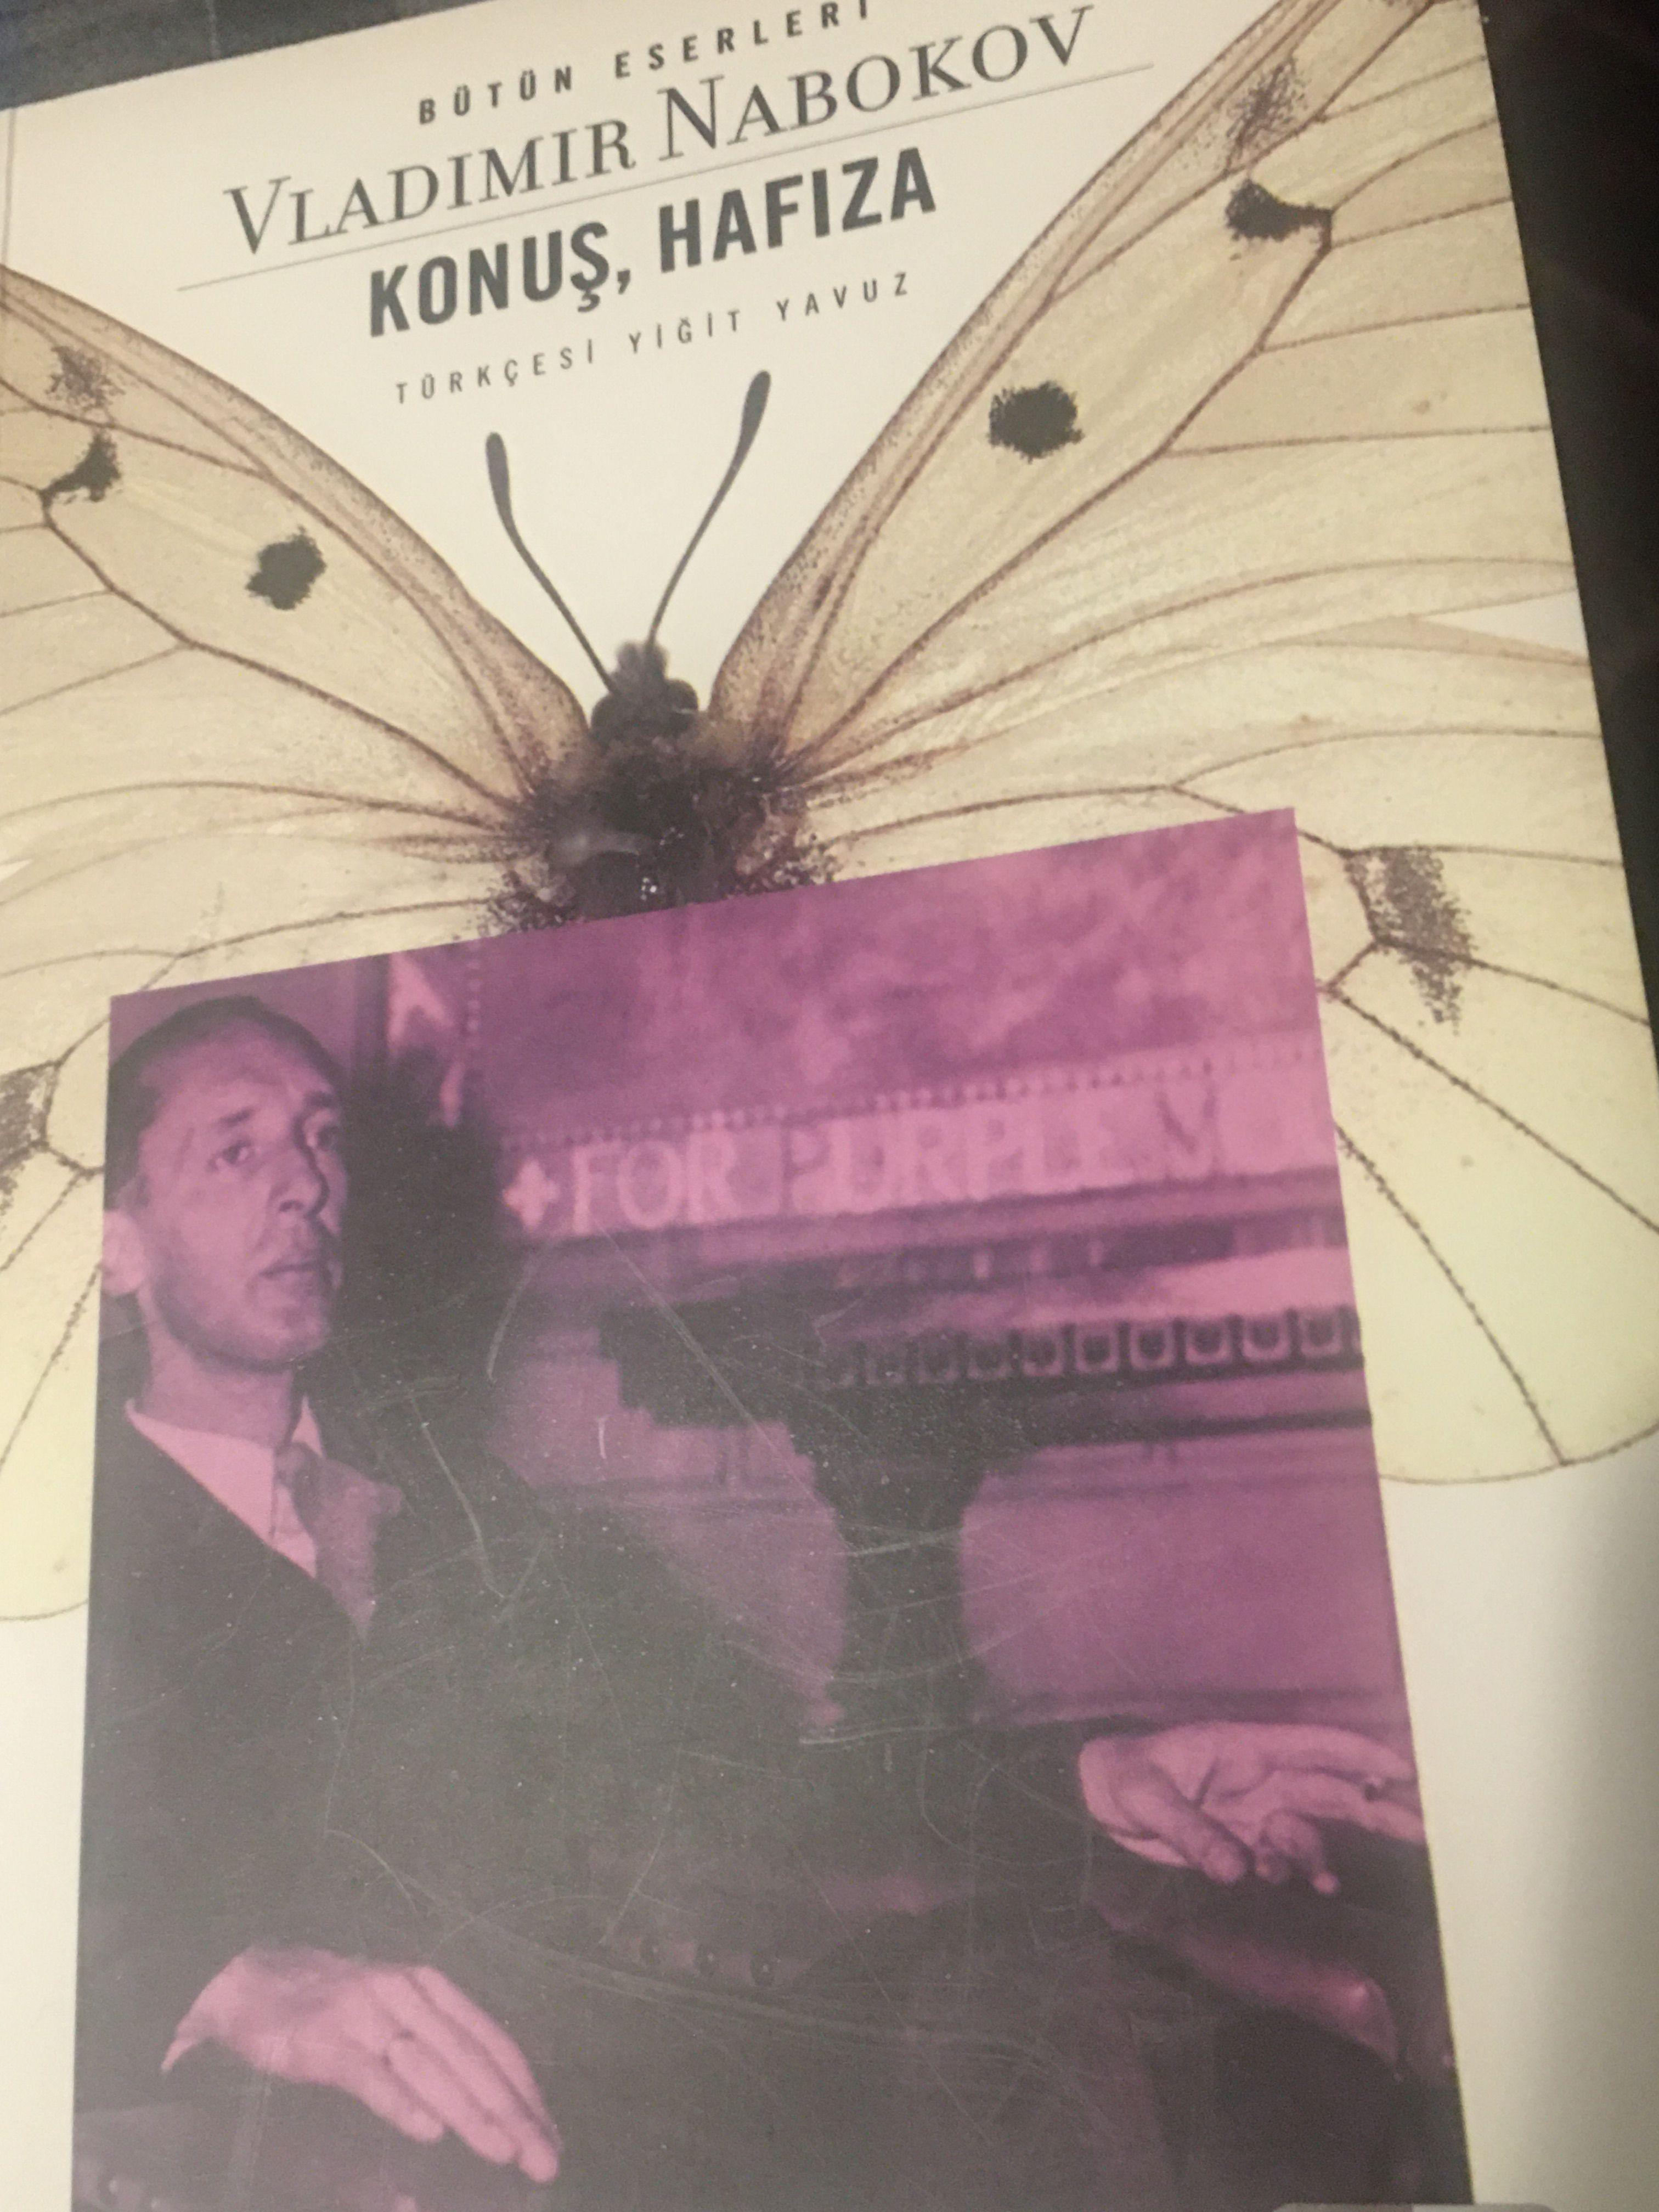 Ihsan Alboga Adli Kullanicinin Yazarlar Kitaplari Ve Filimler Panosundaki Pin 2020 Kitap Yazarlar Vladimir Nabokov